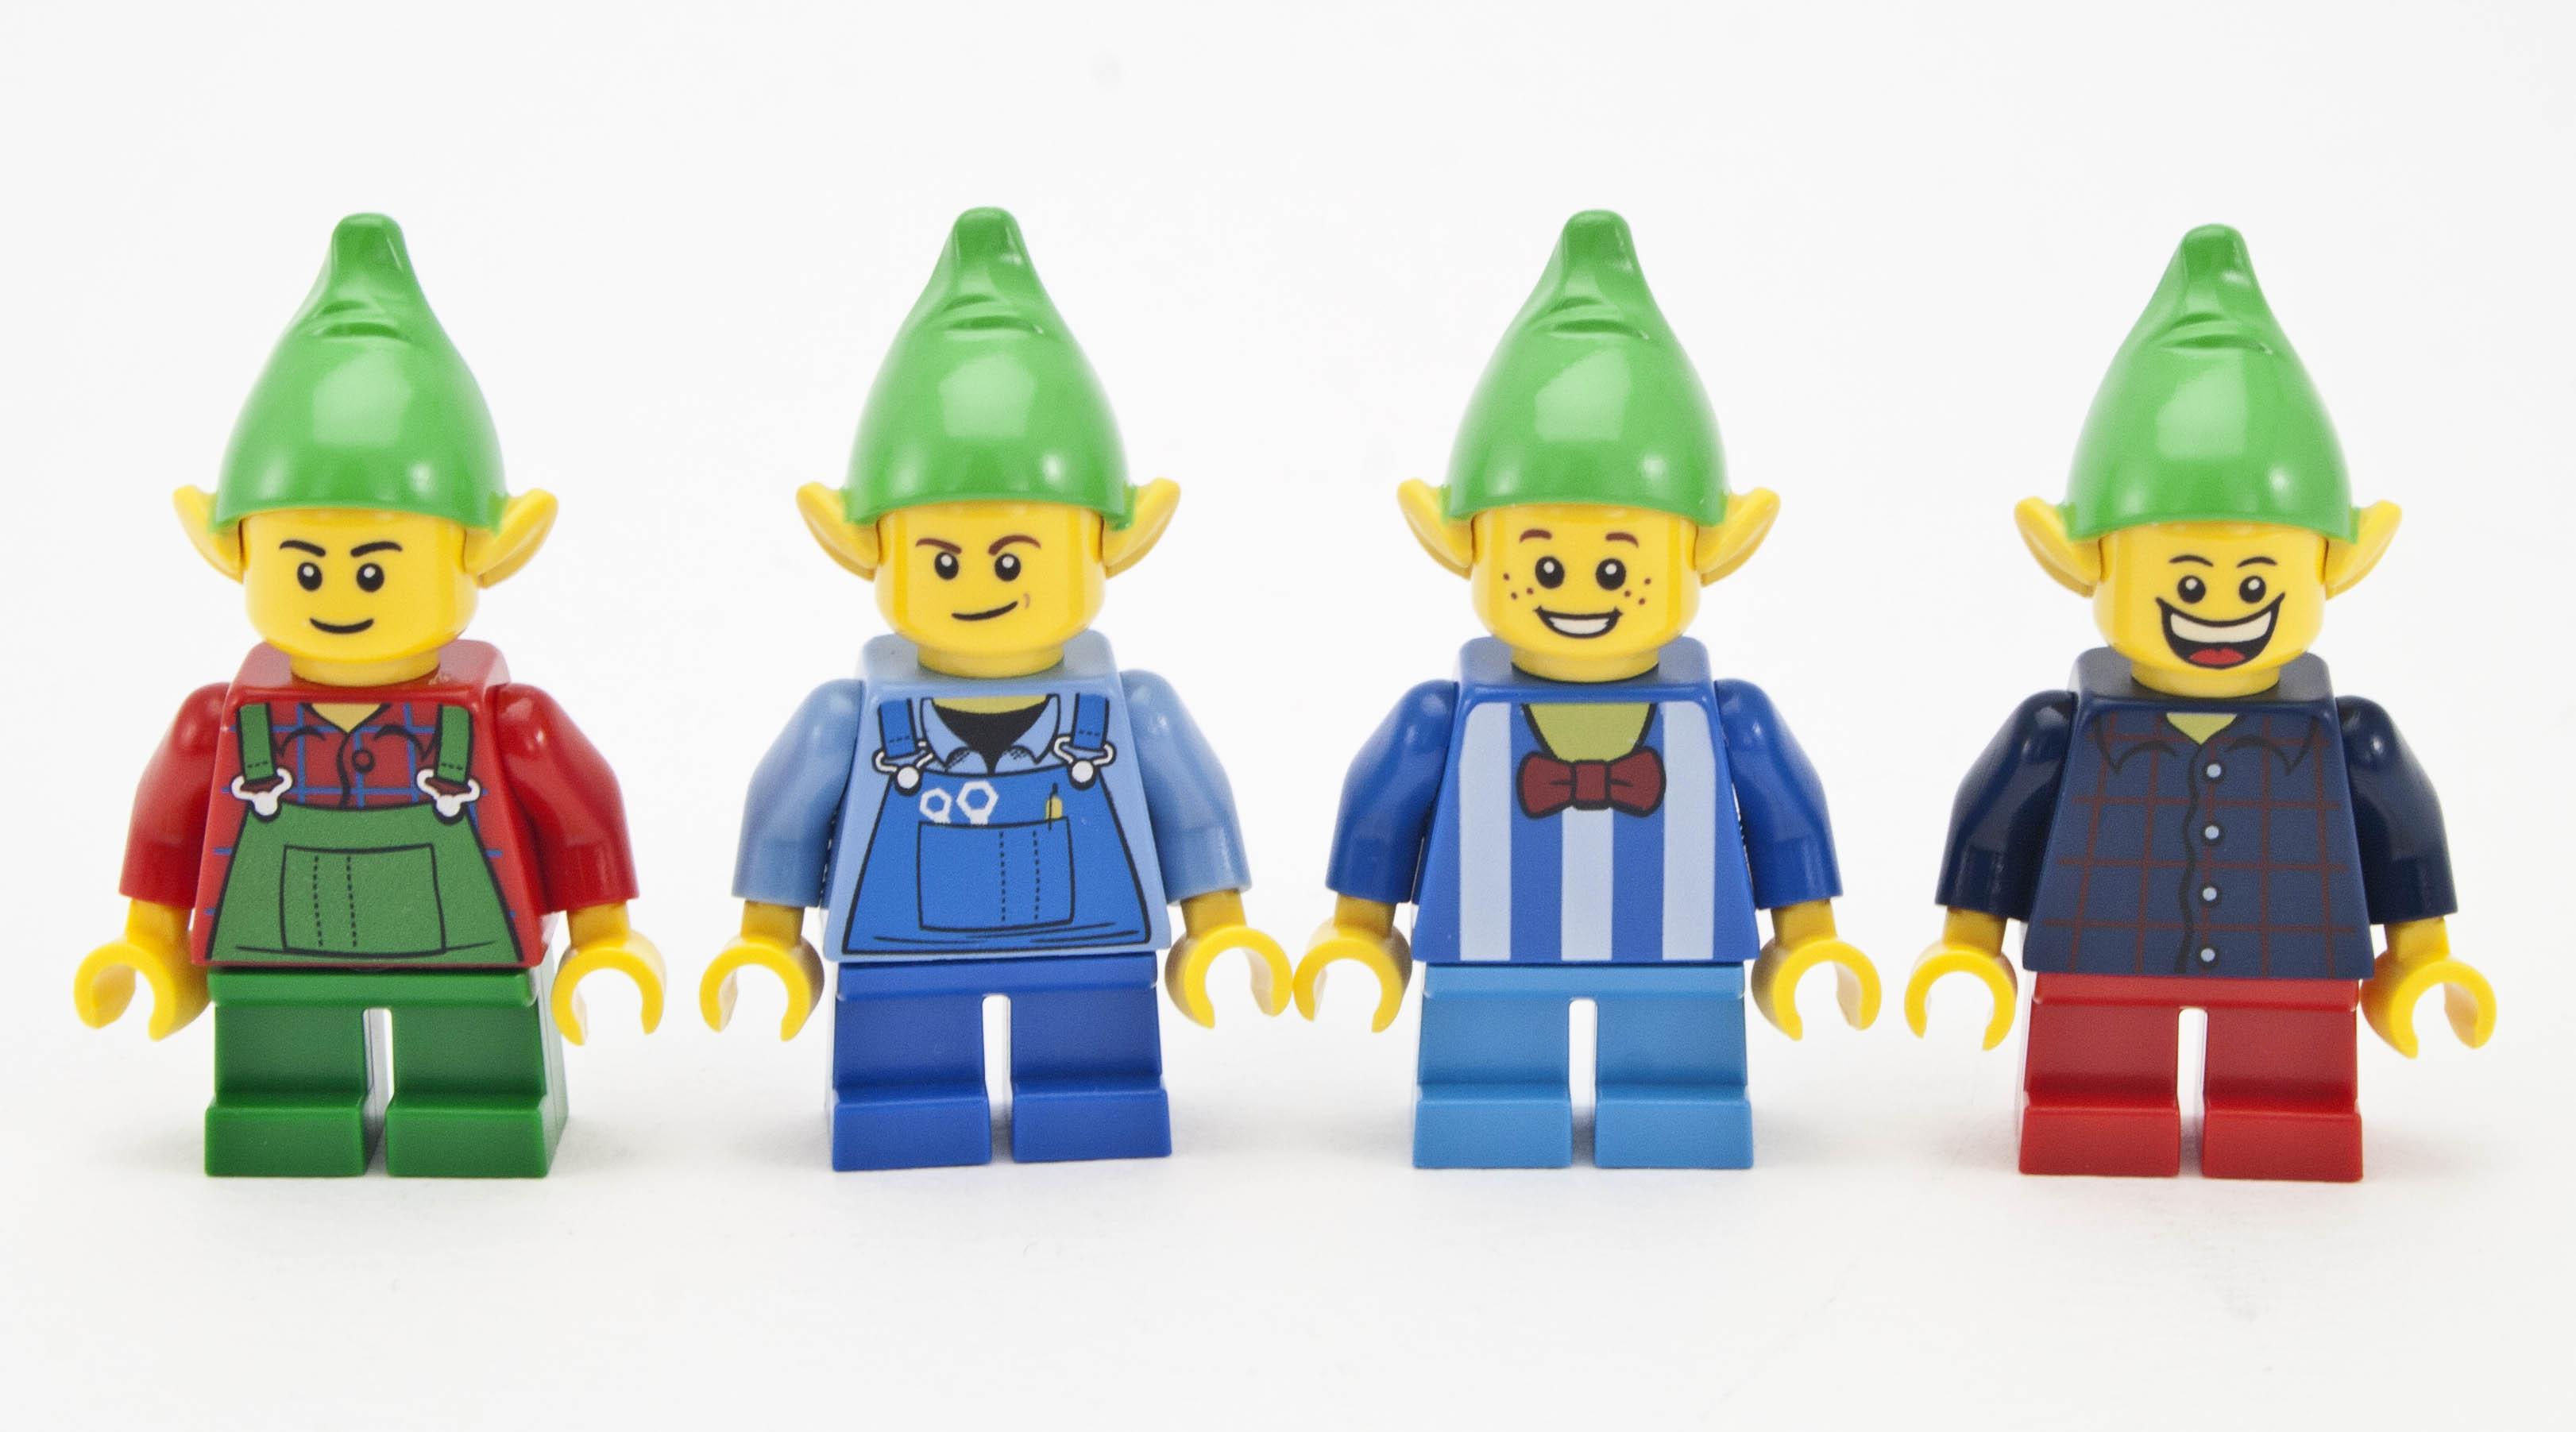 Lego Sack review 10245 santa s workshop rebrickable build with lego